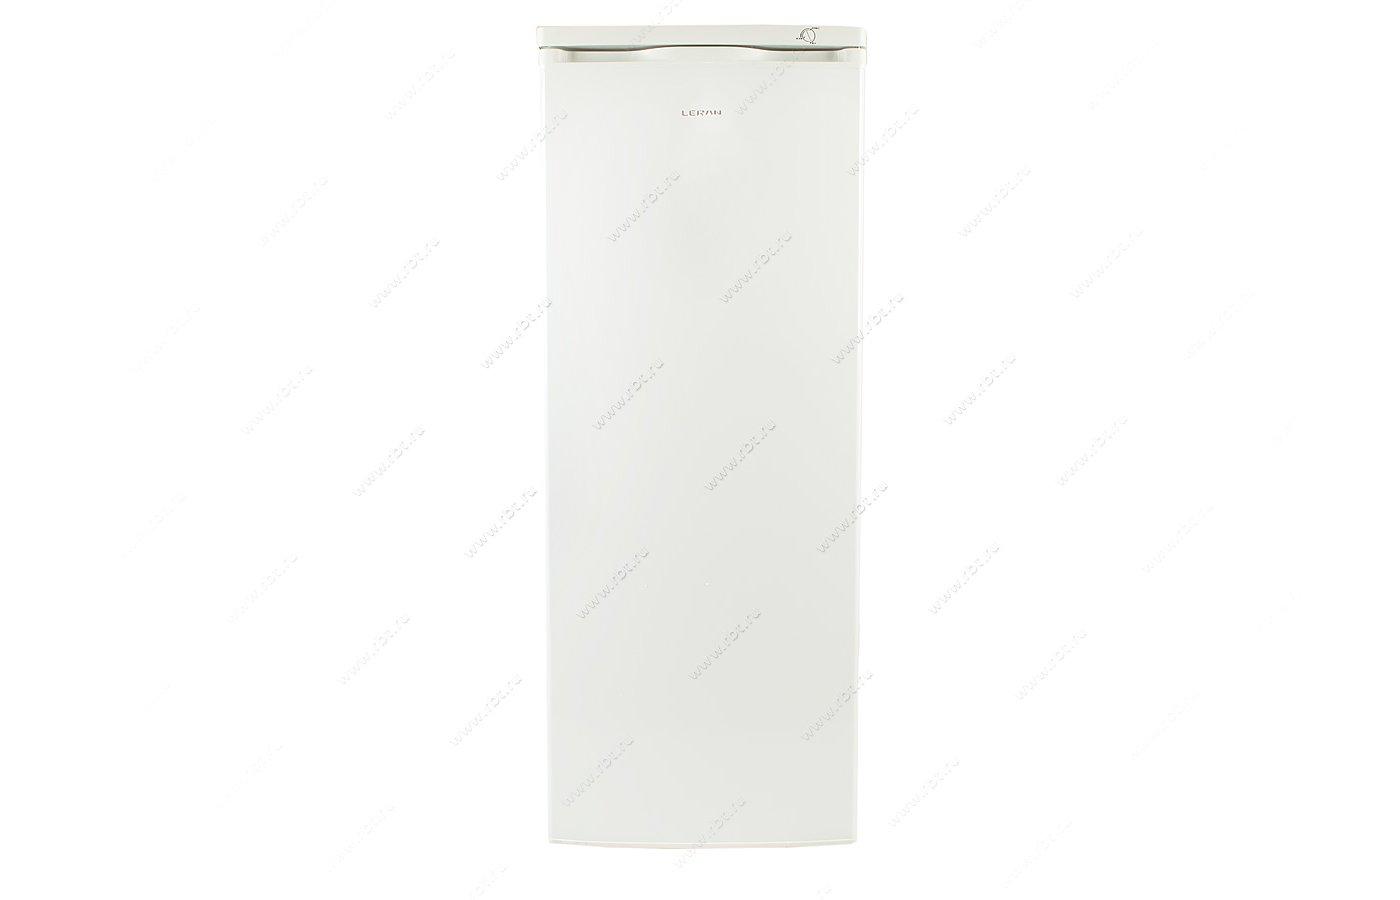 Морозильная камера вертикальная LERAN FSF 182 W